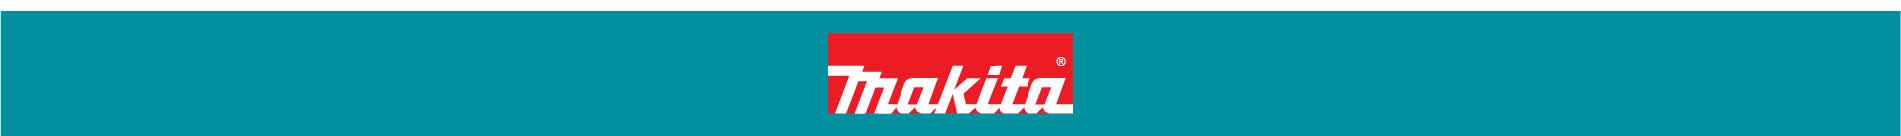 Makita Brand Banner